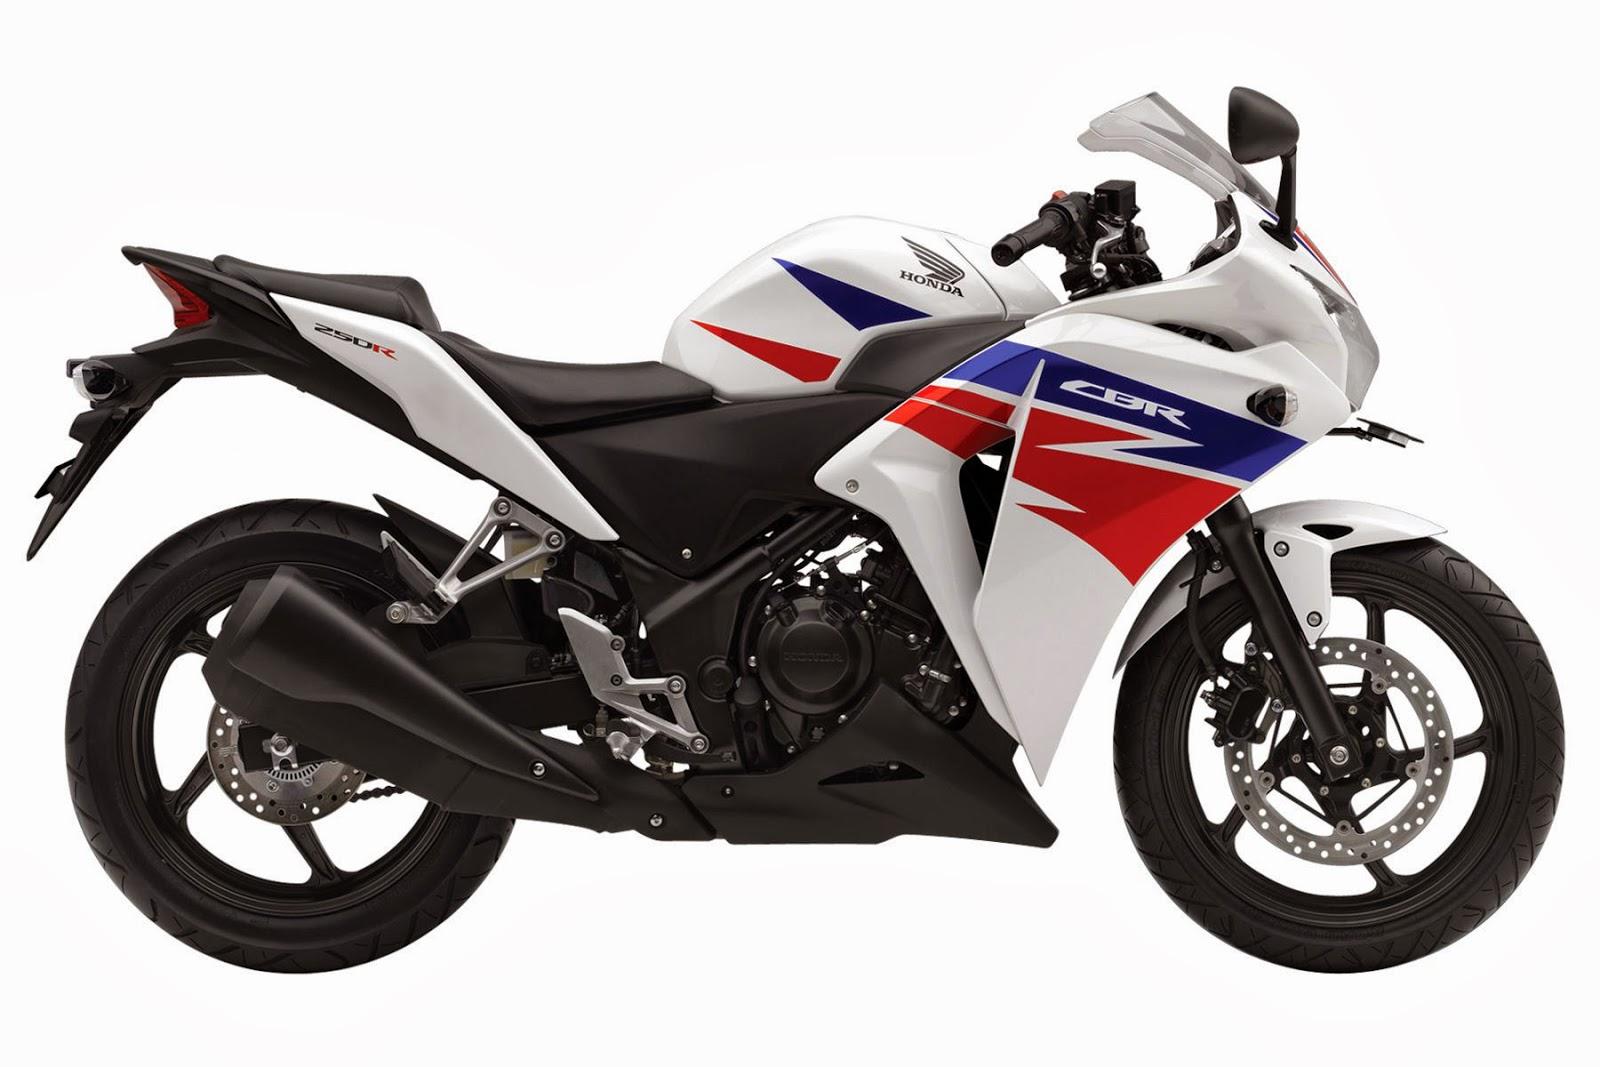 Perbandingan Ninja 250cc Vs Honda CBR 250cc